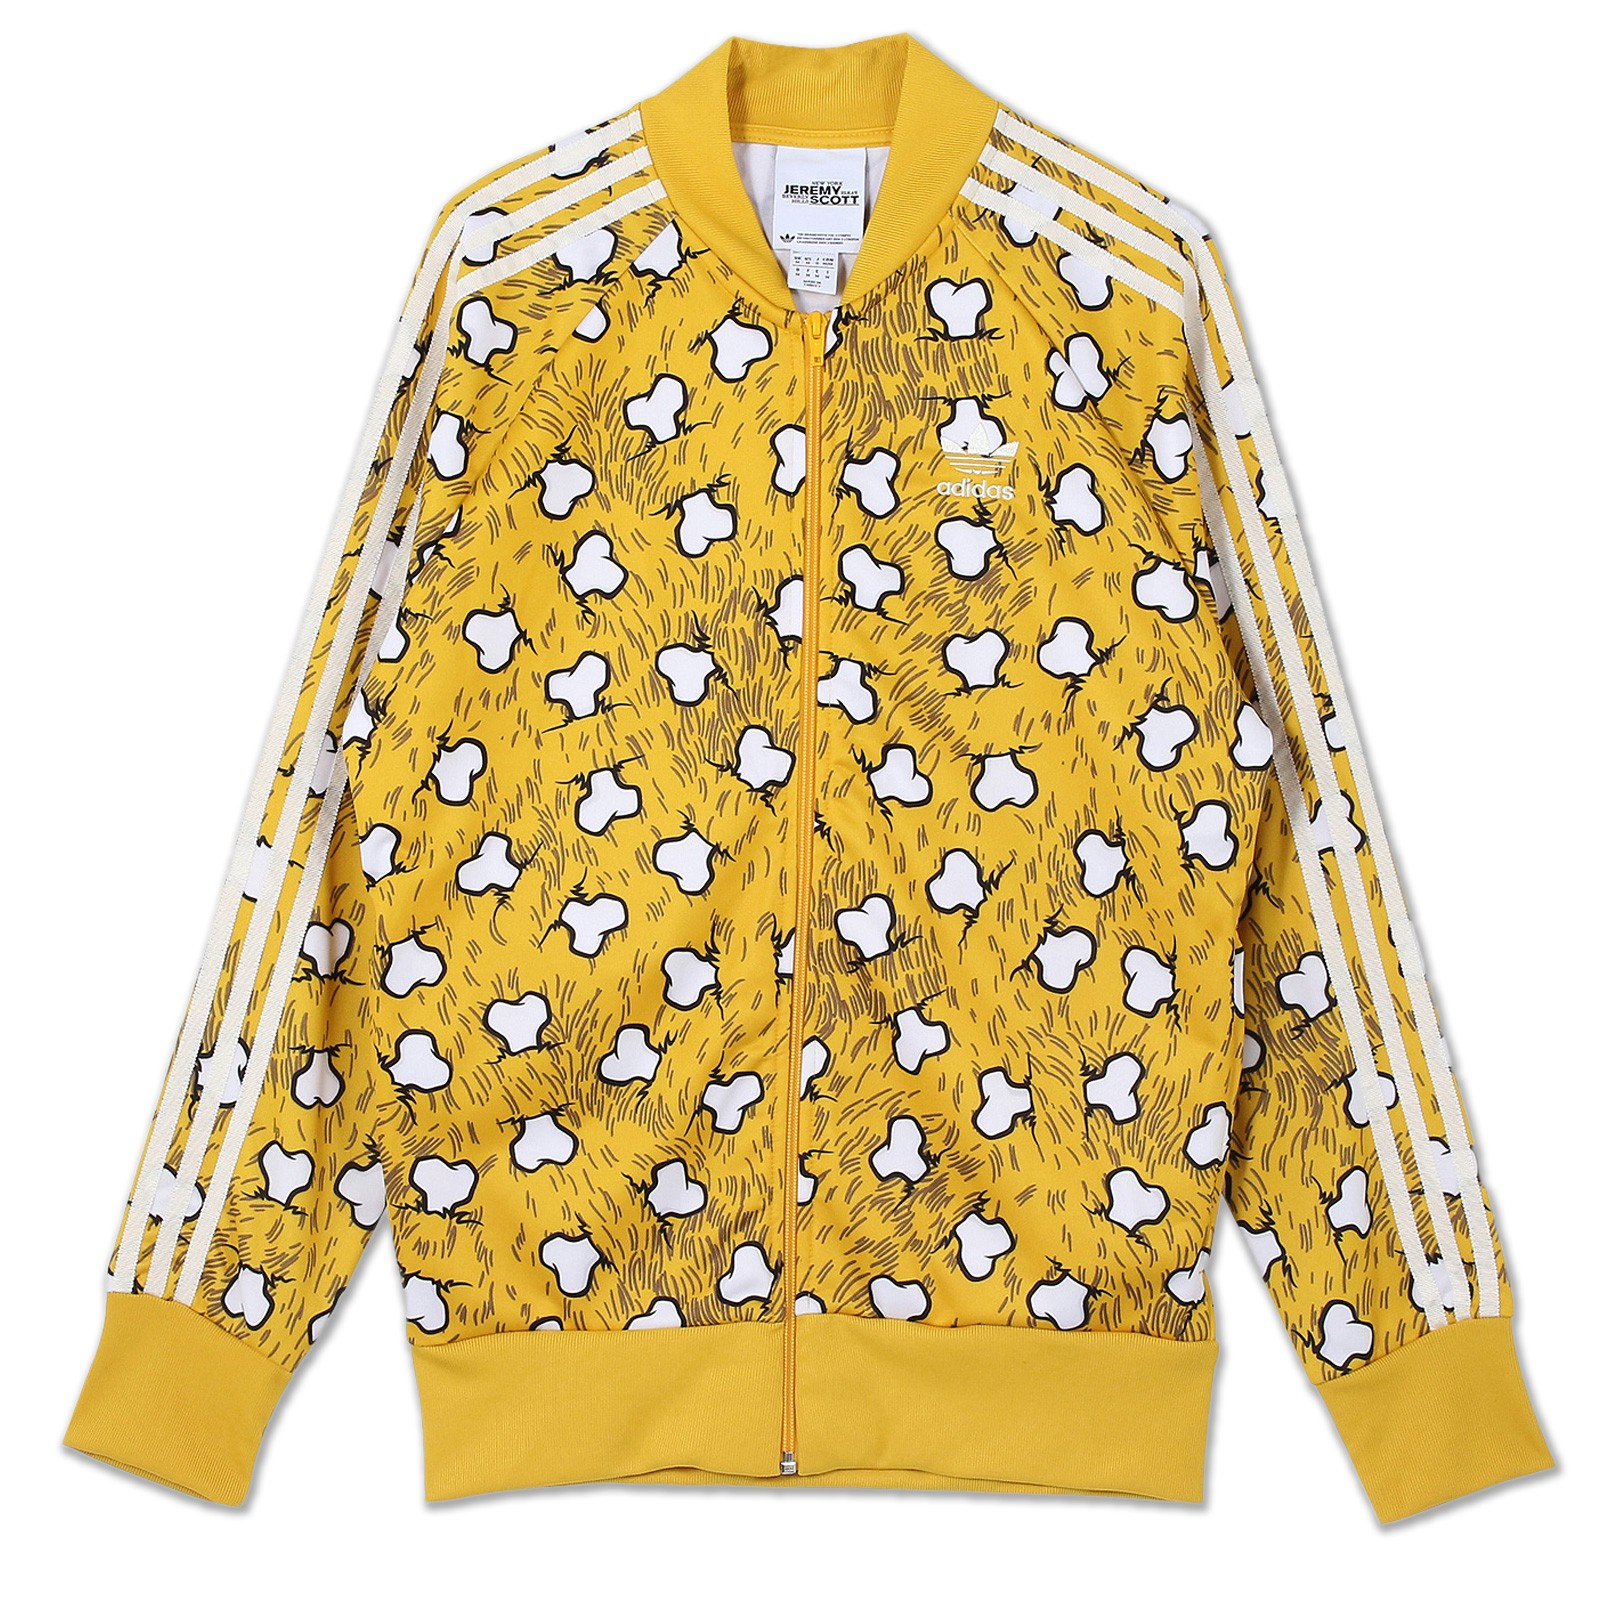 adidas jeremy scott jacket